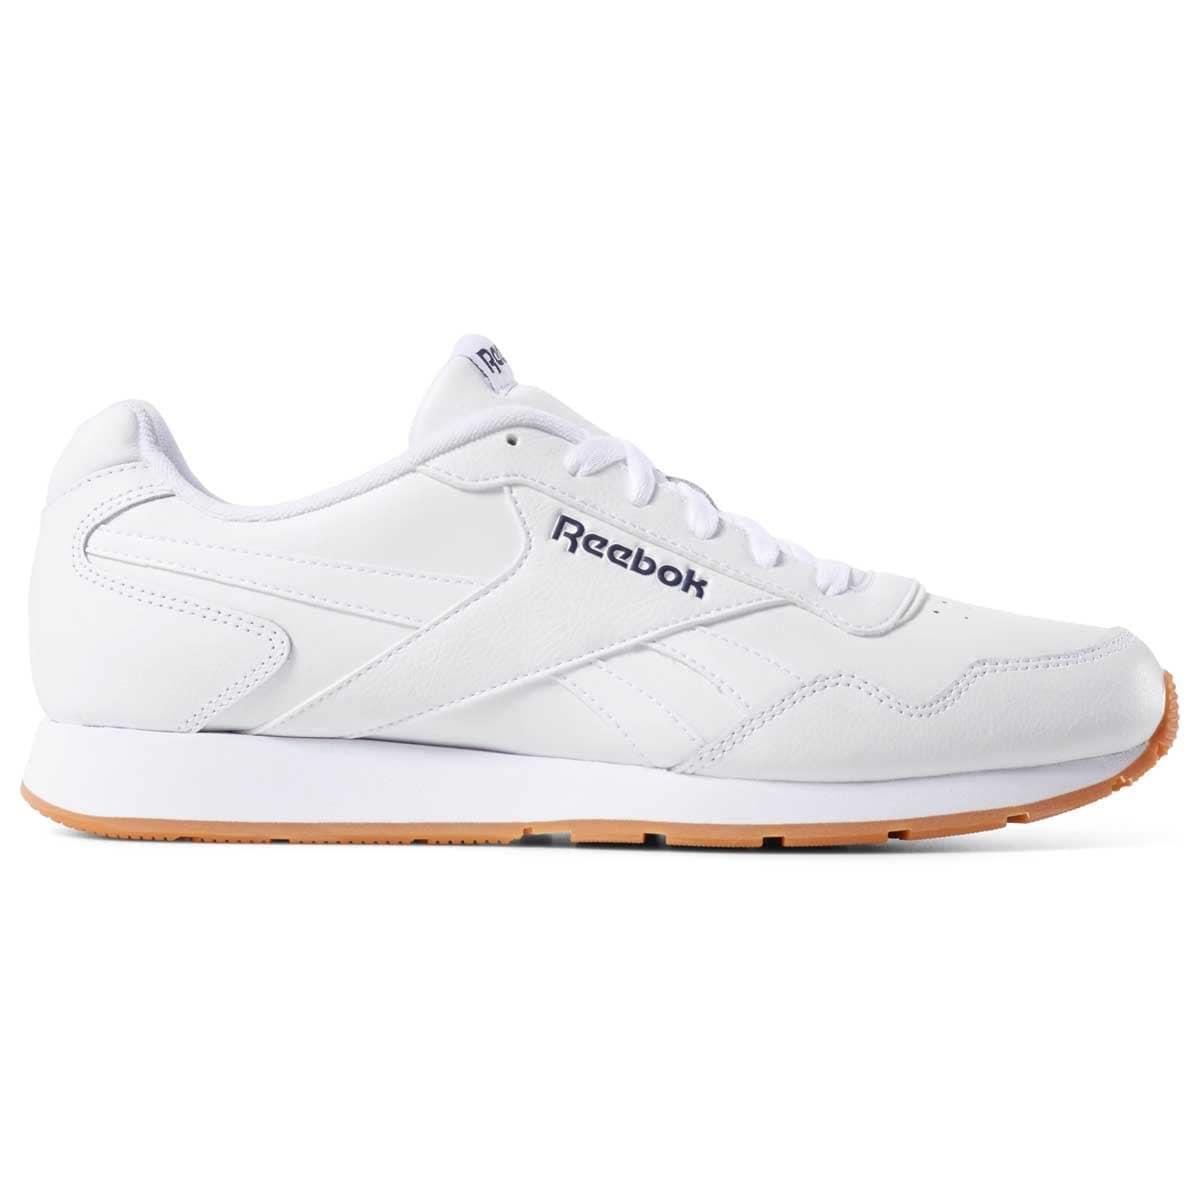 Tenis Royal Glide Running Blanco Reebok - Caballero